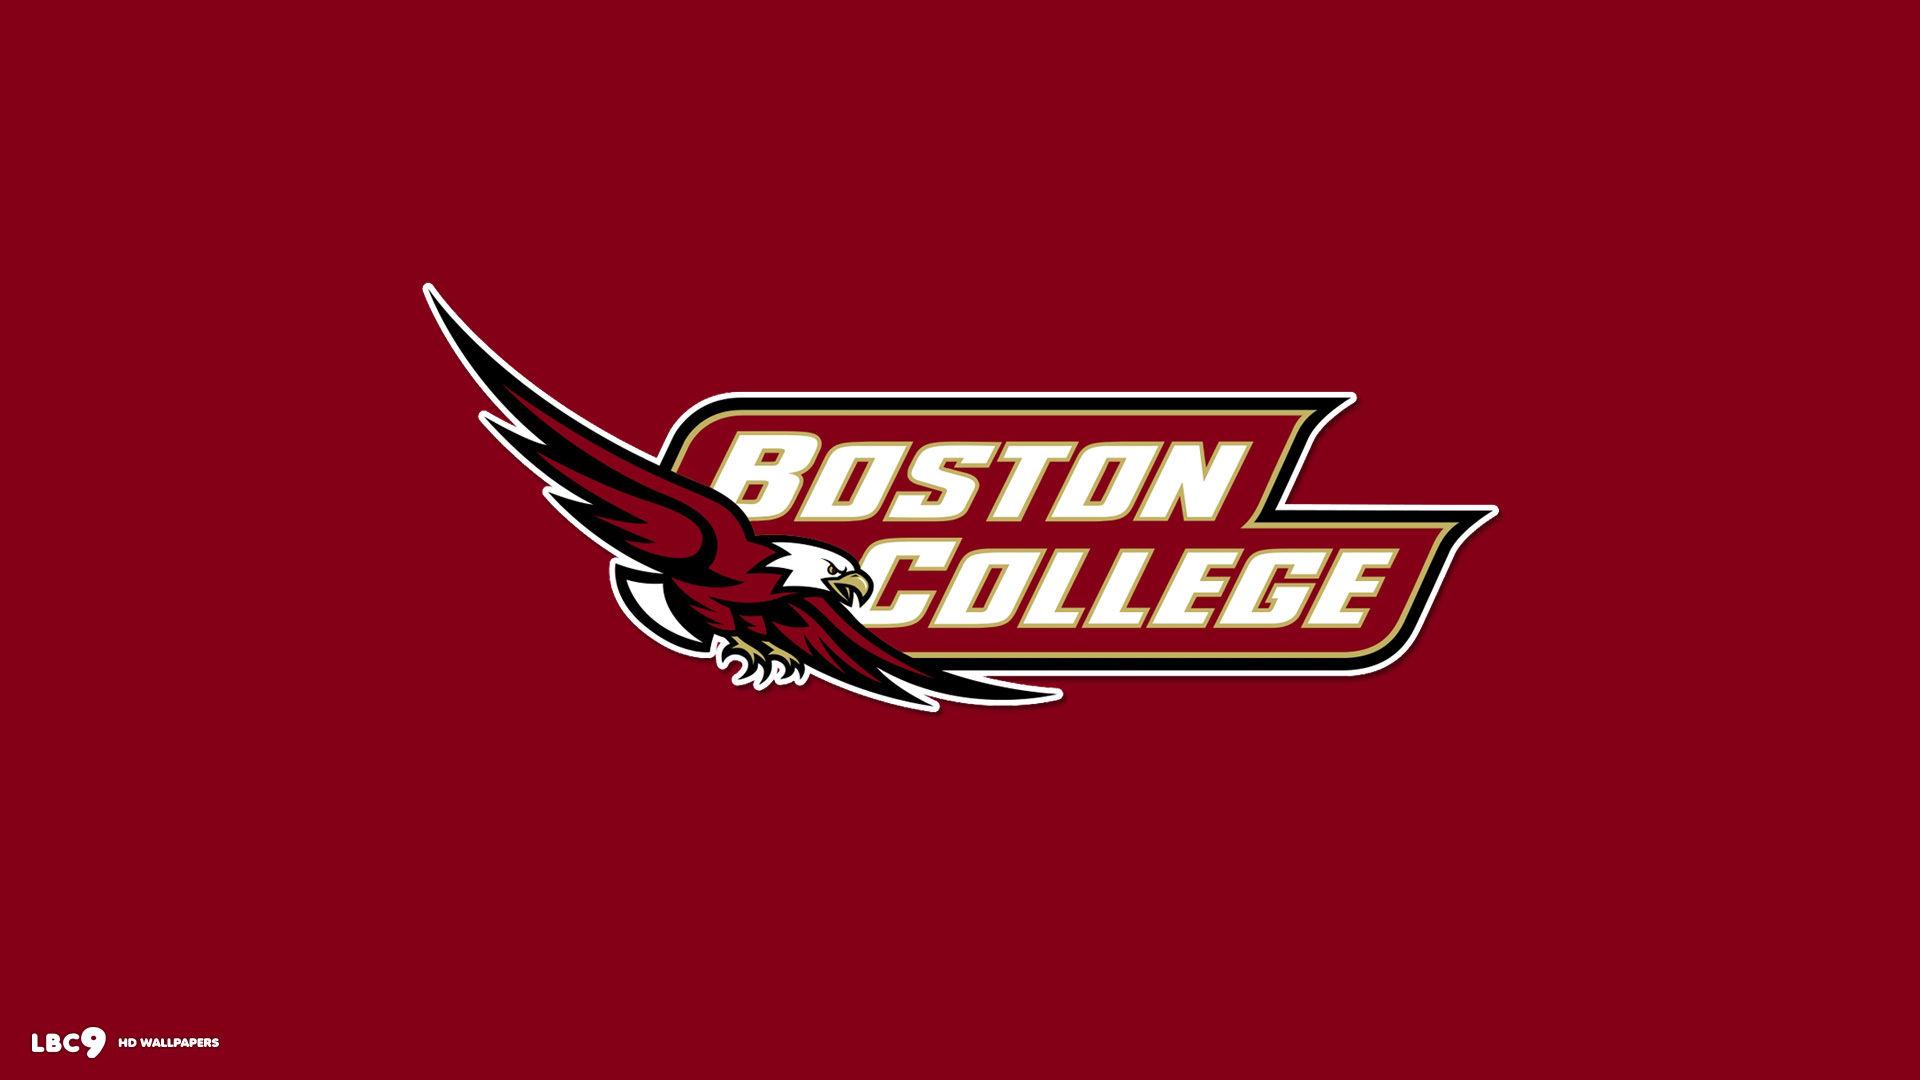 boston college eagles wallpaper 12 college athletics hd backgrounds 1920x1080